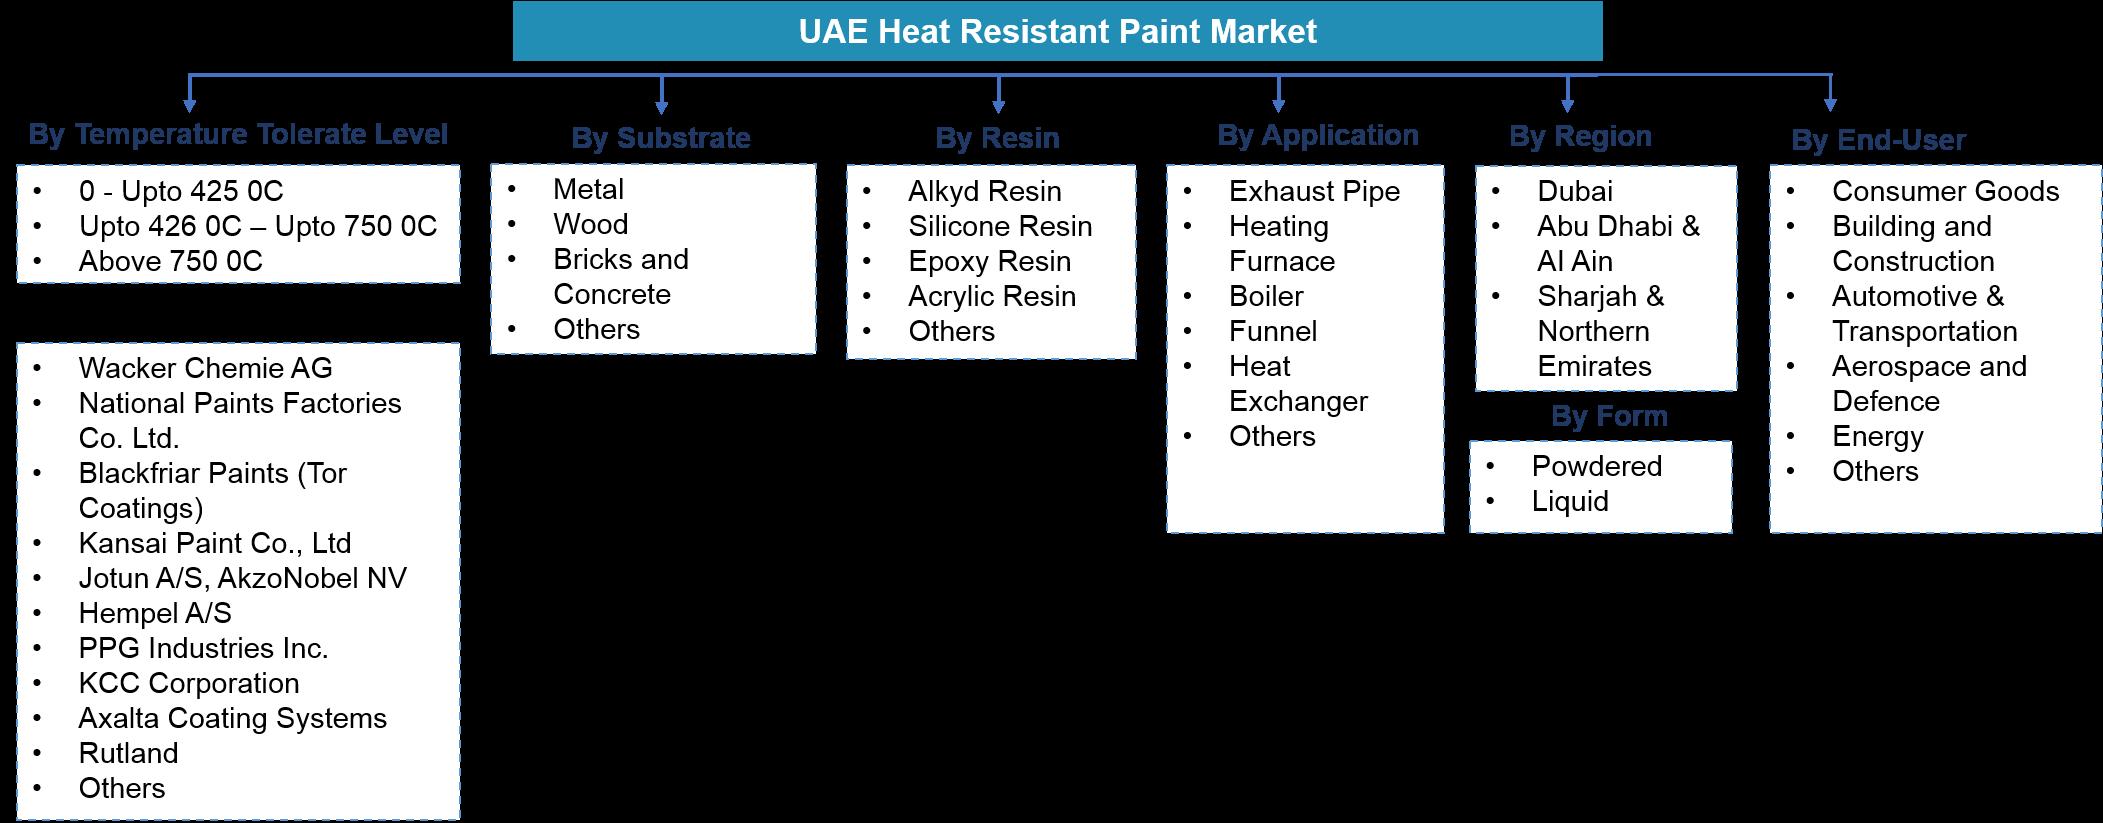 UAE Heat Resistant Paint Market Segmentation